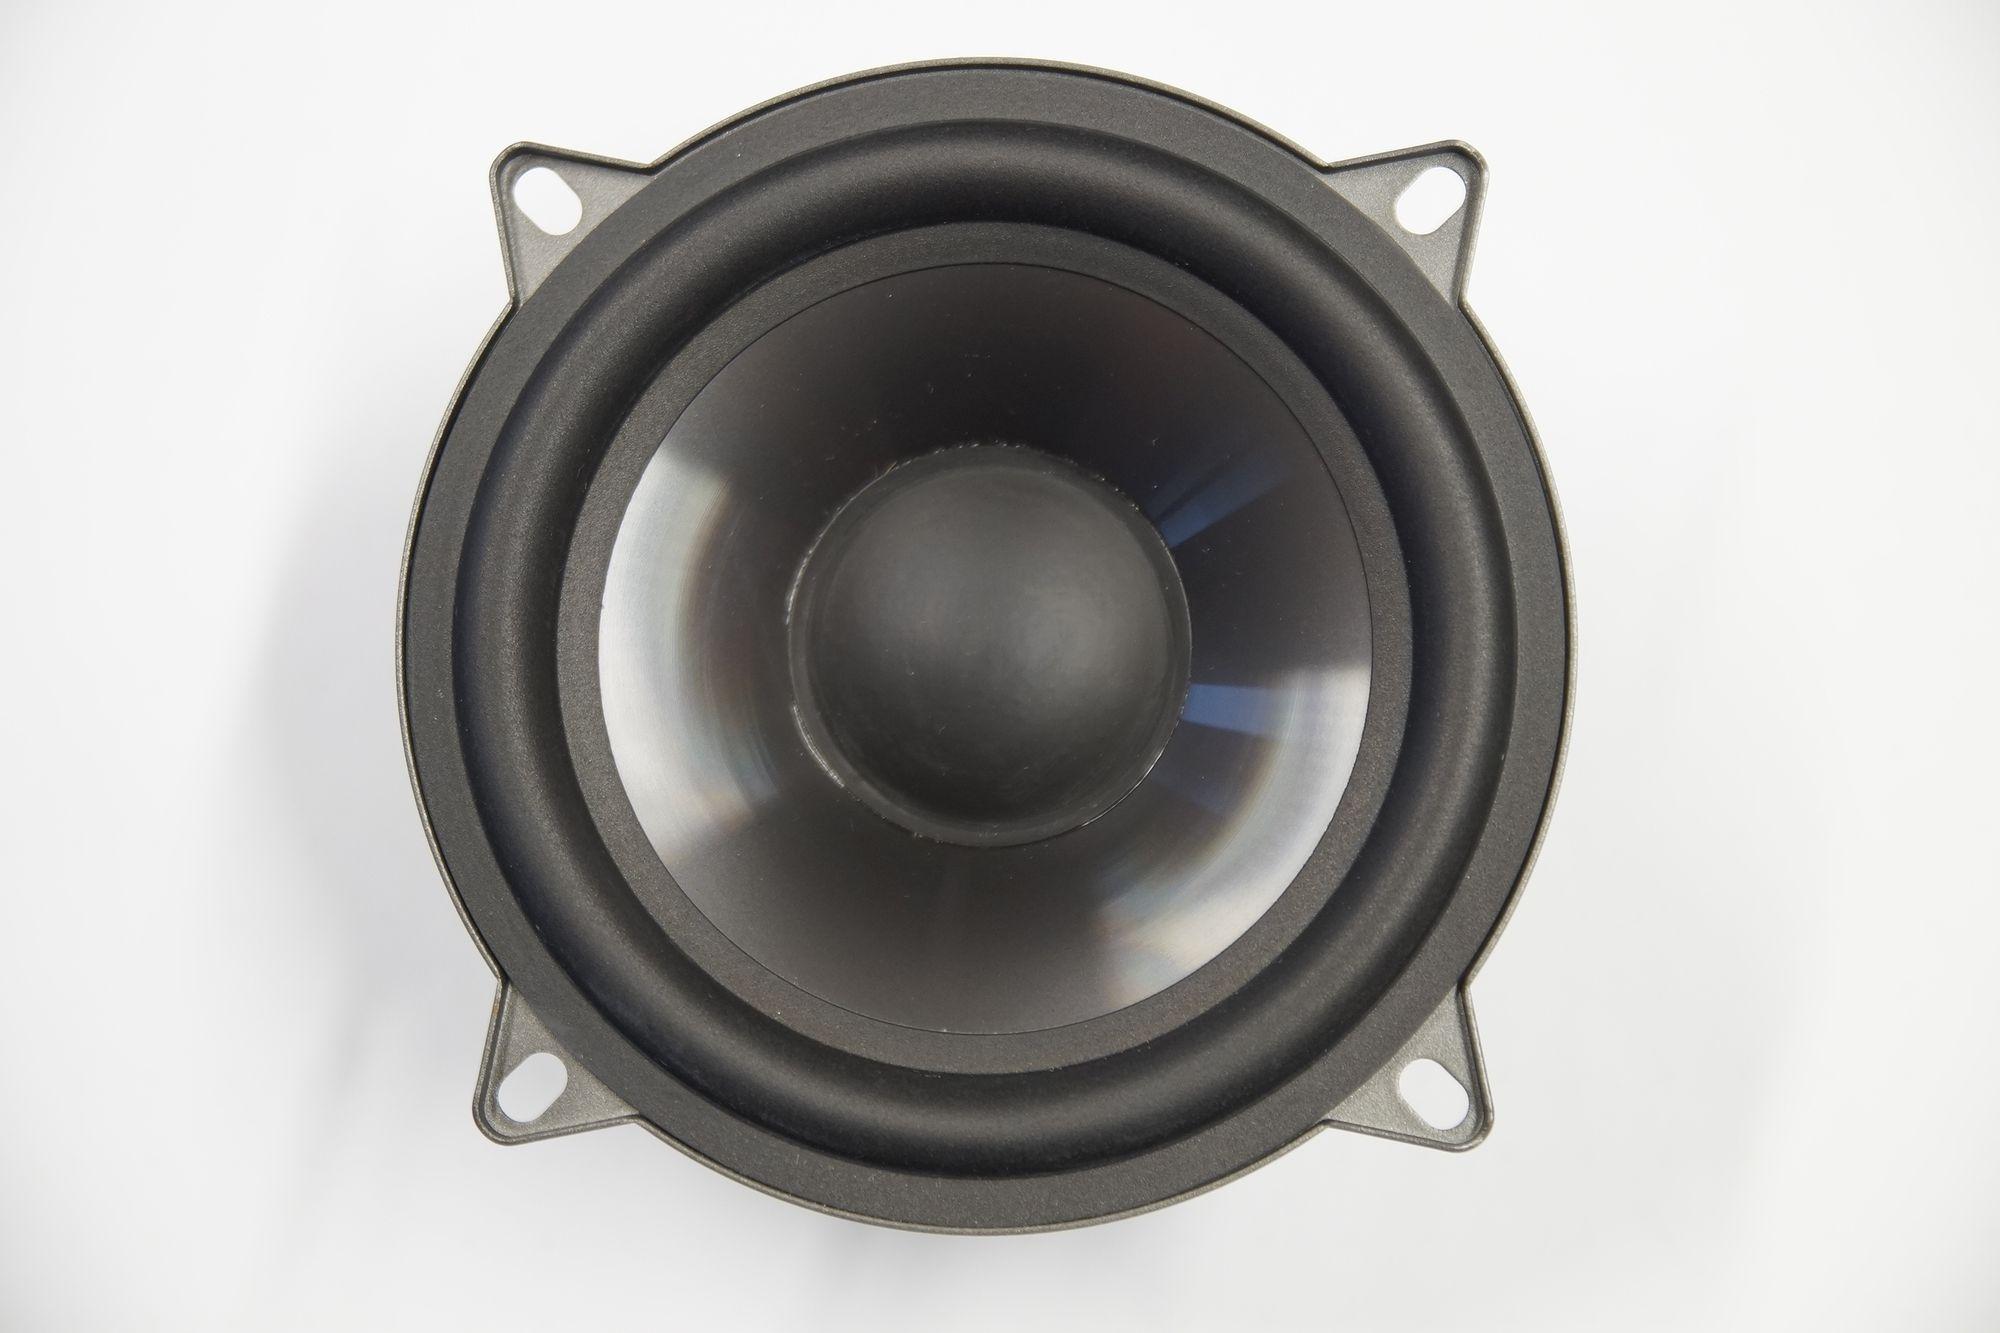 1 Paar 130 mm Woofer Magnat Stratos 320, 300 Watt max Serviceware 001